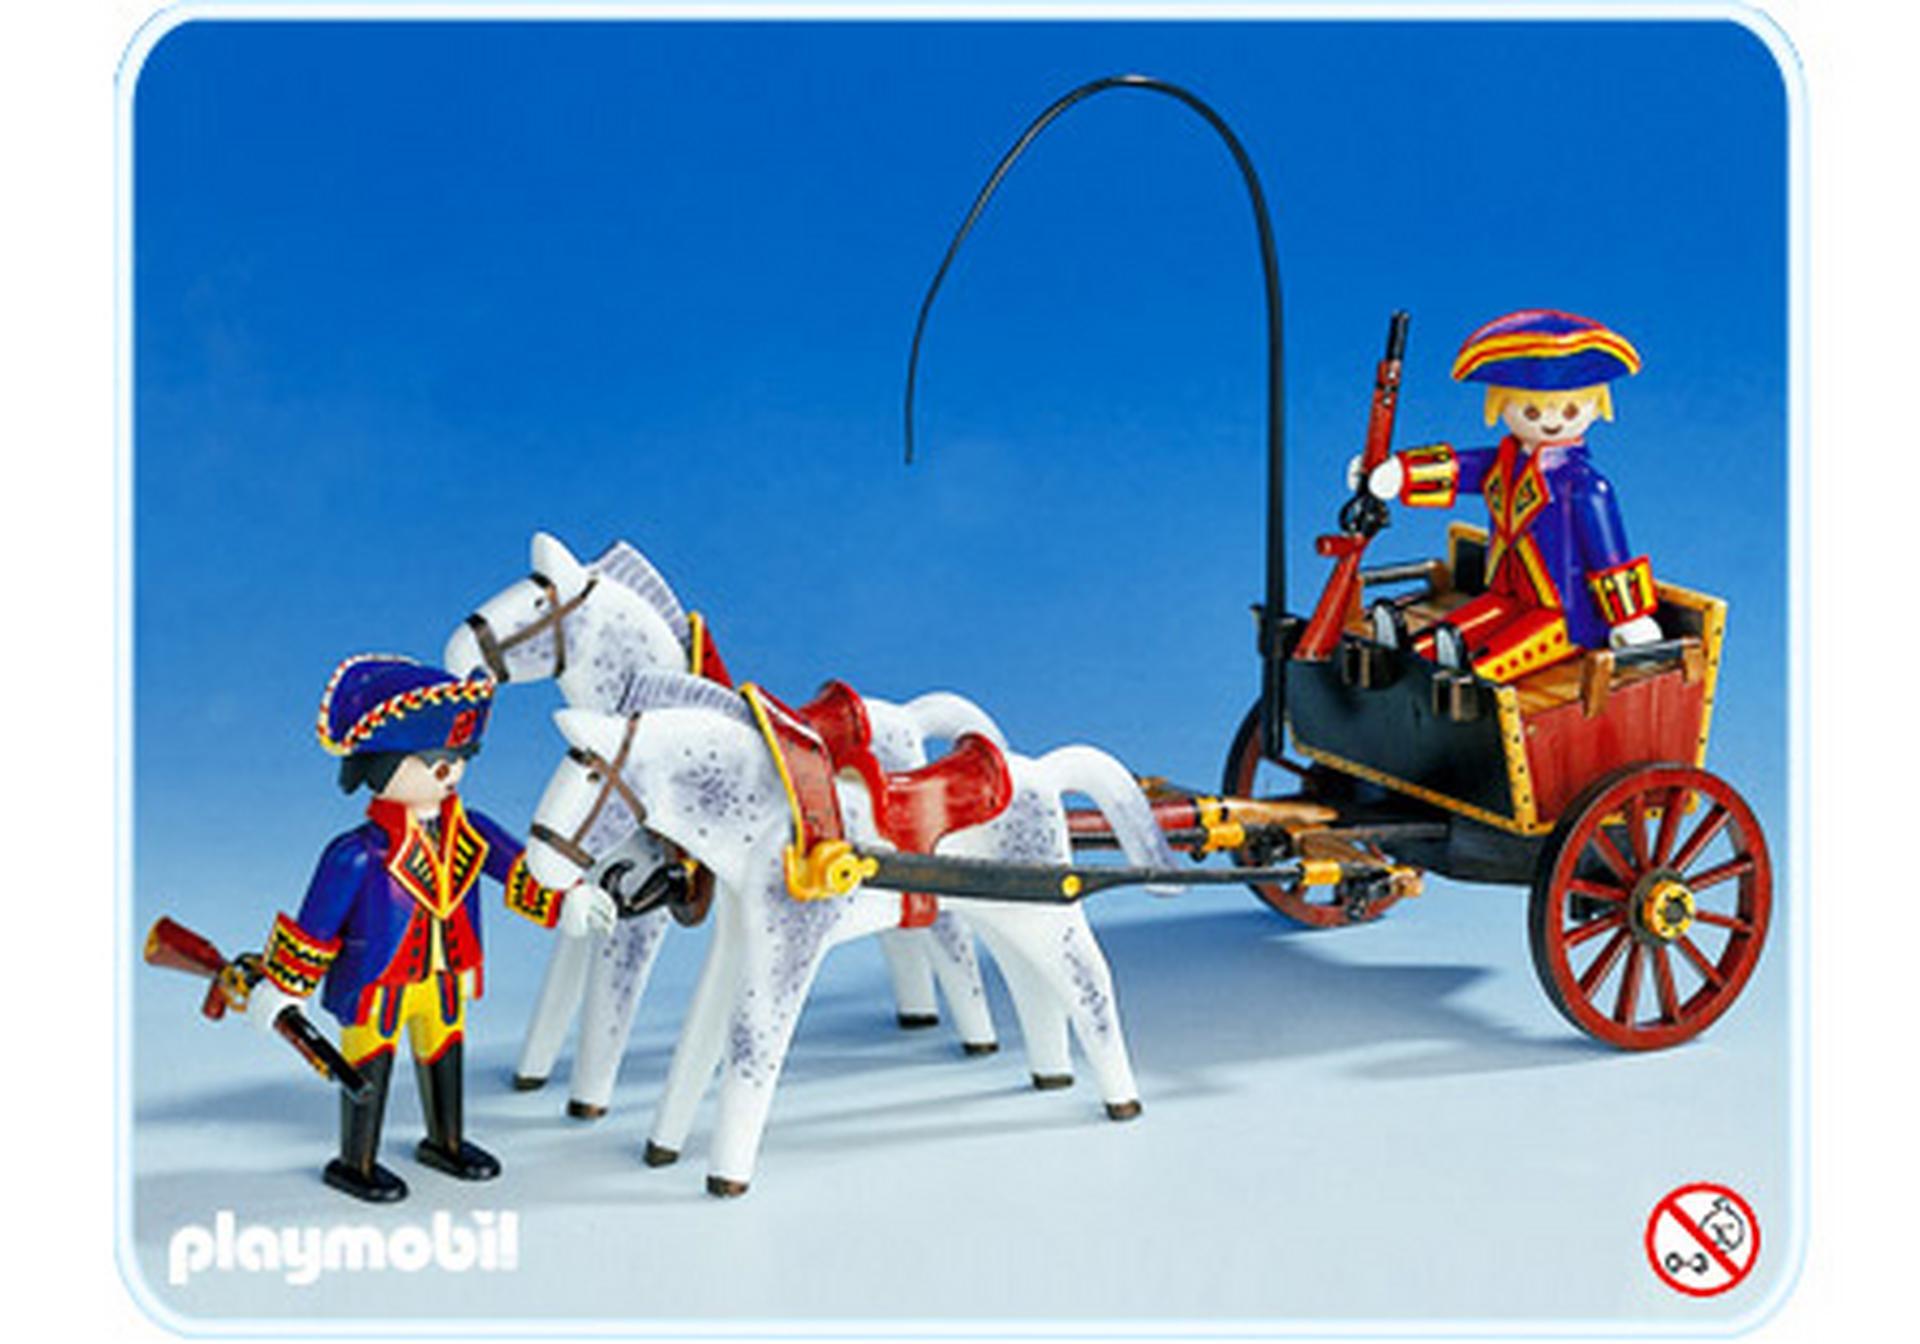 Kutsche pferd soldaten 3609 a playmobil deutschland - Playmobil kutsche ...